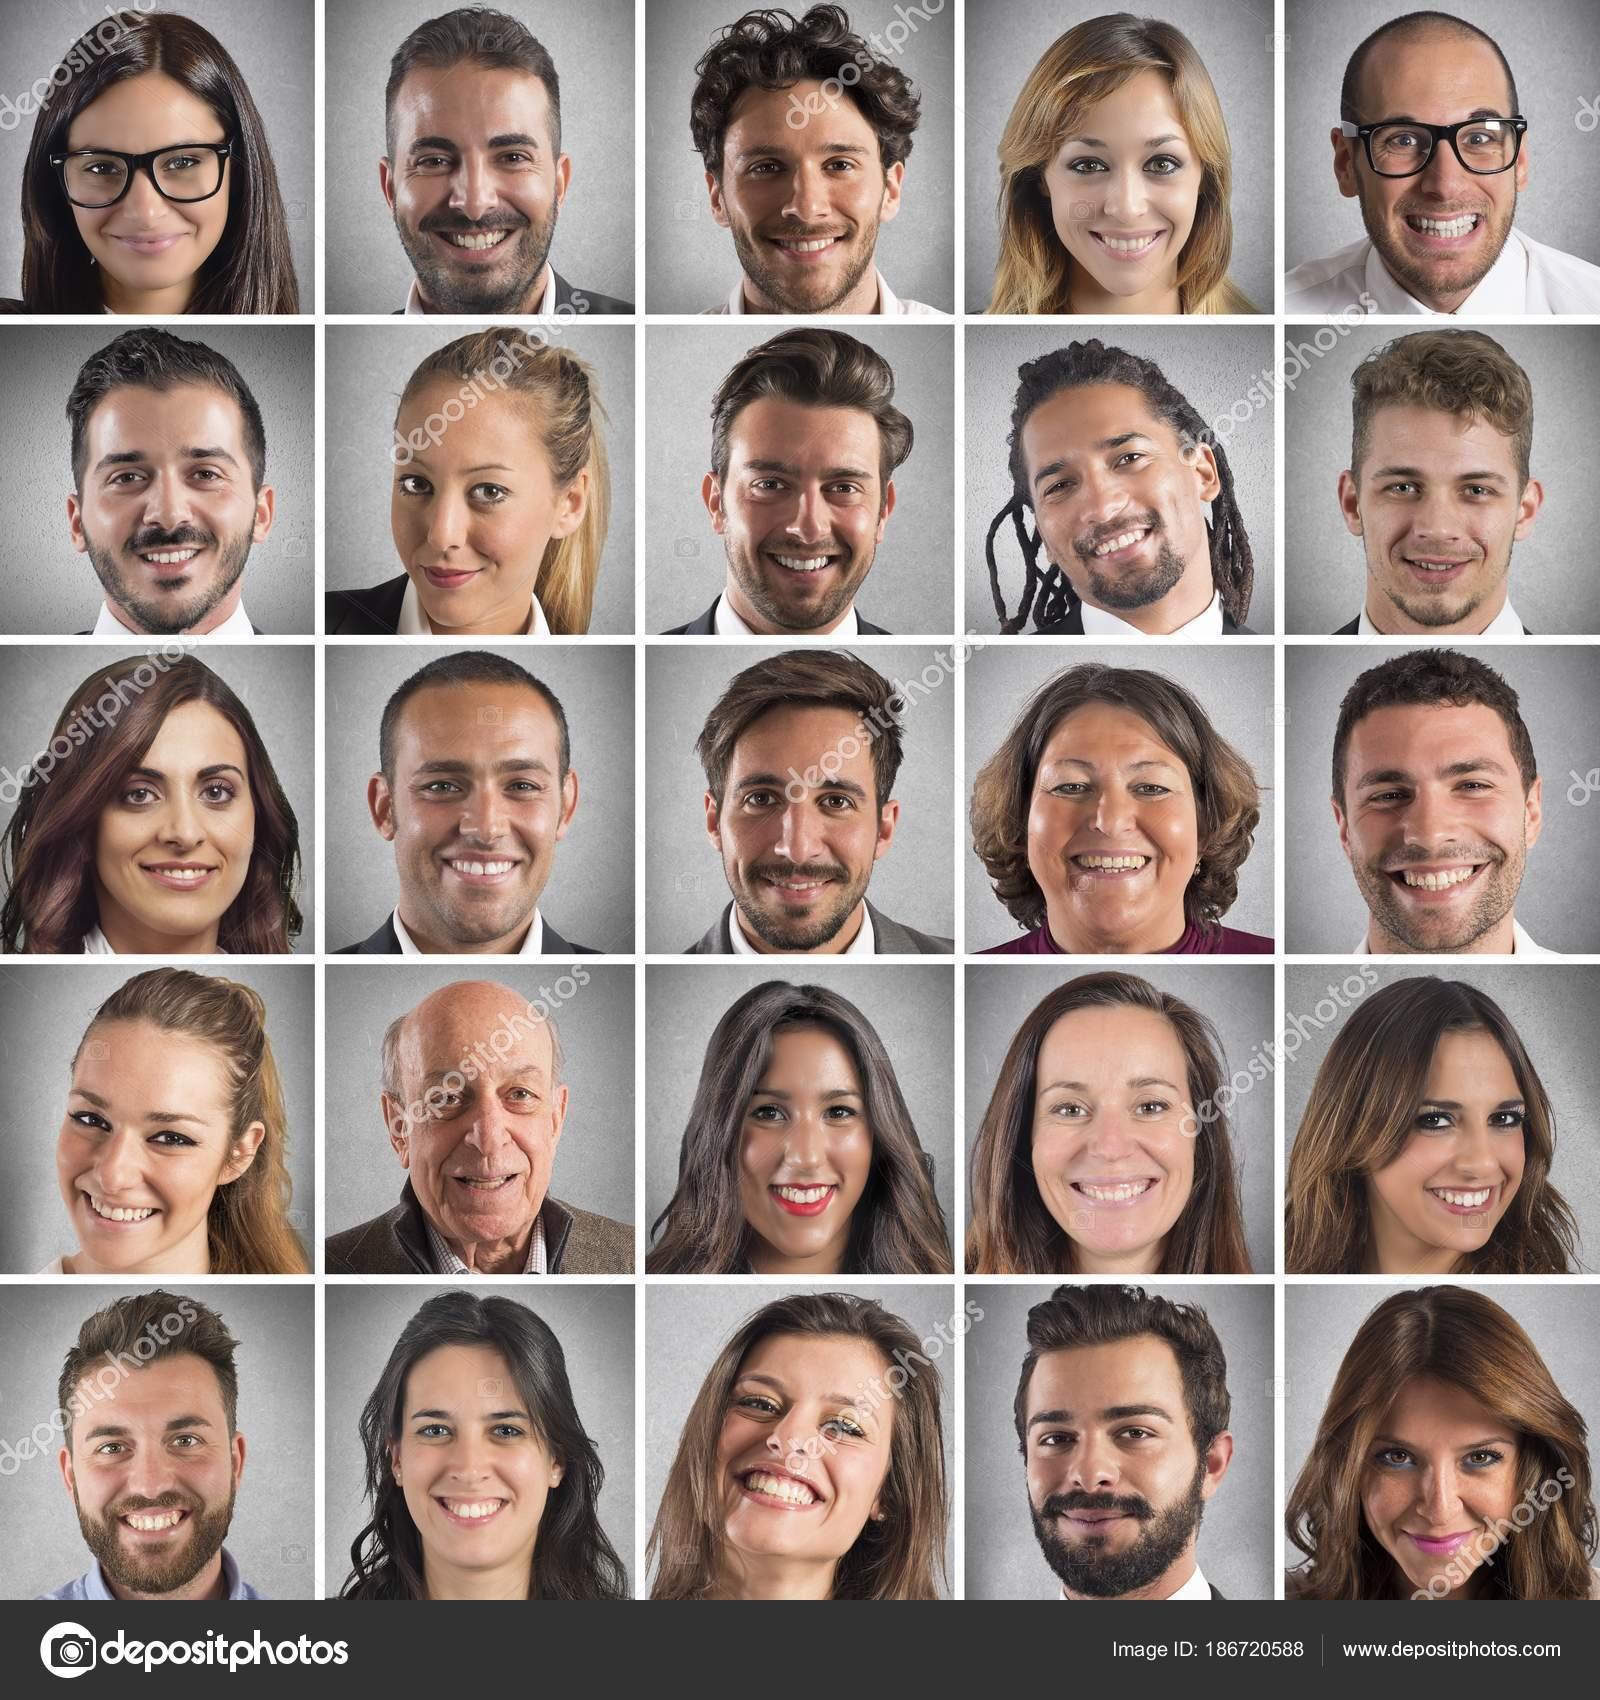 smiling faces collage stock photo alphaspirit 186720588